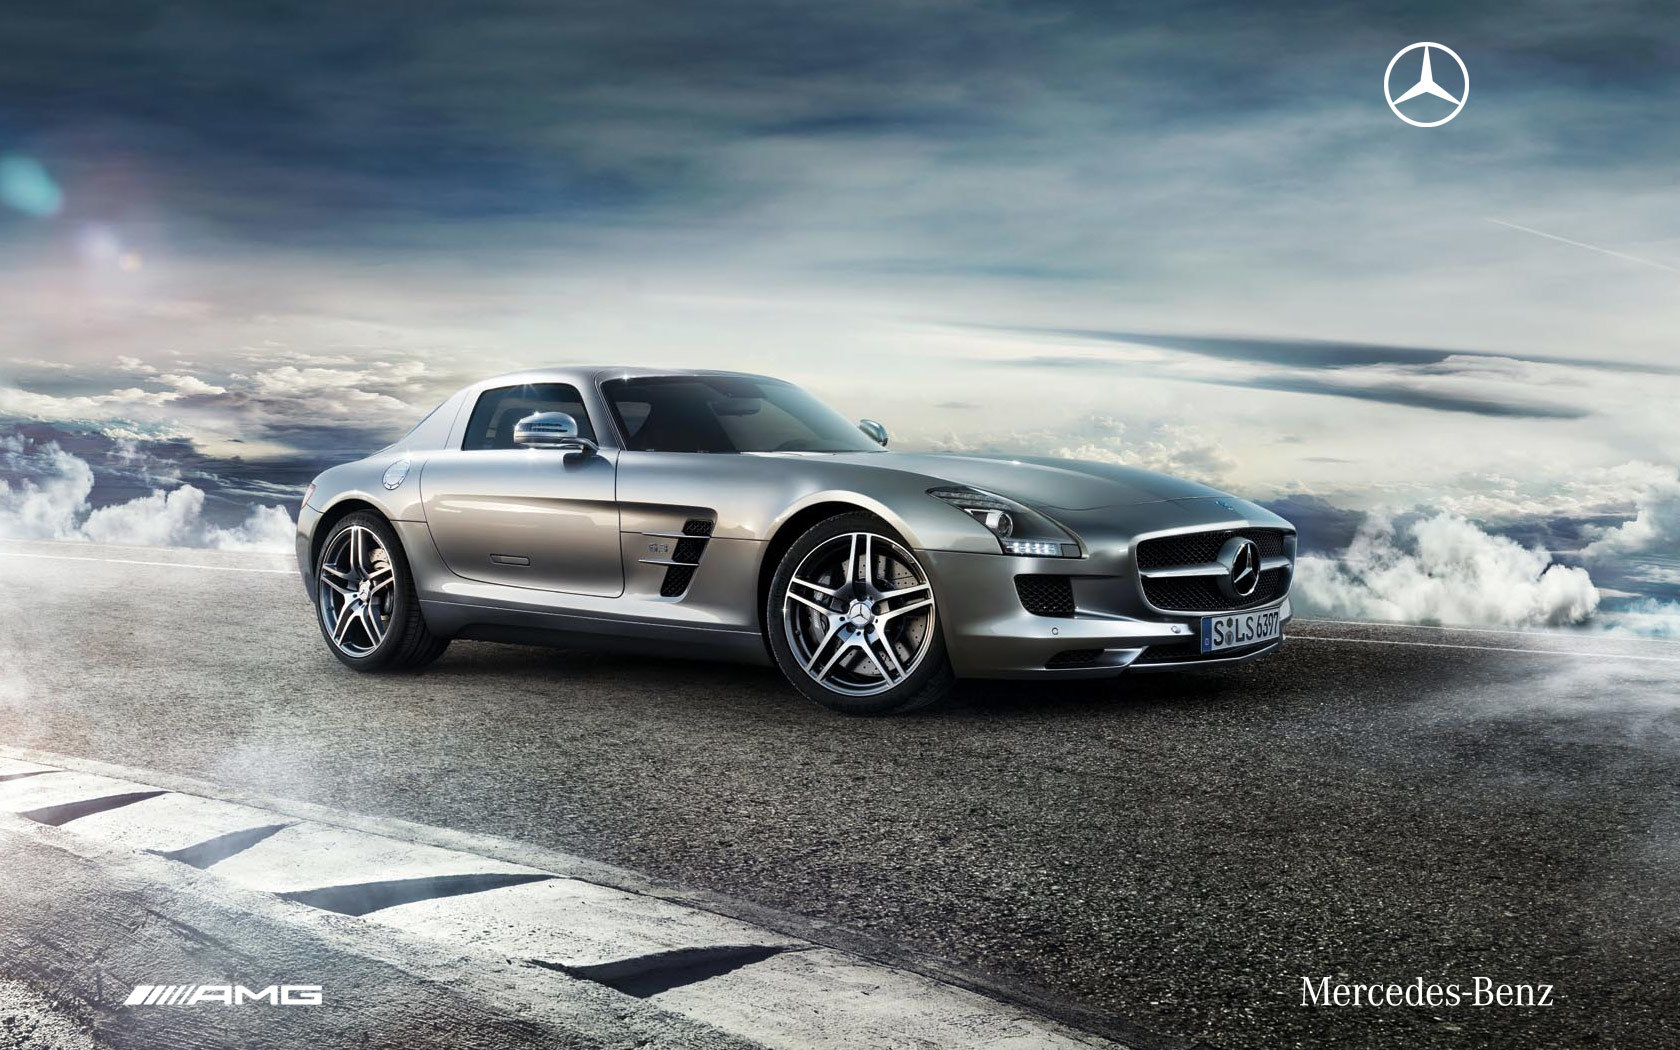 Mercedes Benz Wallpapers Hd